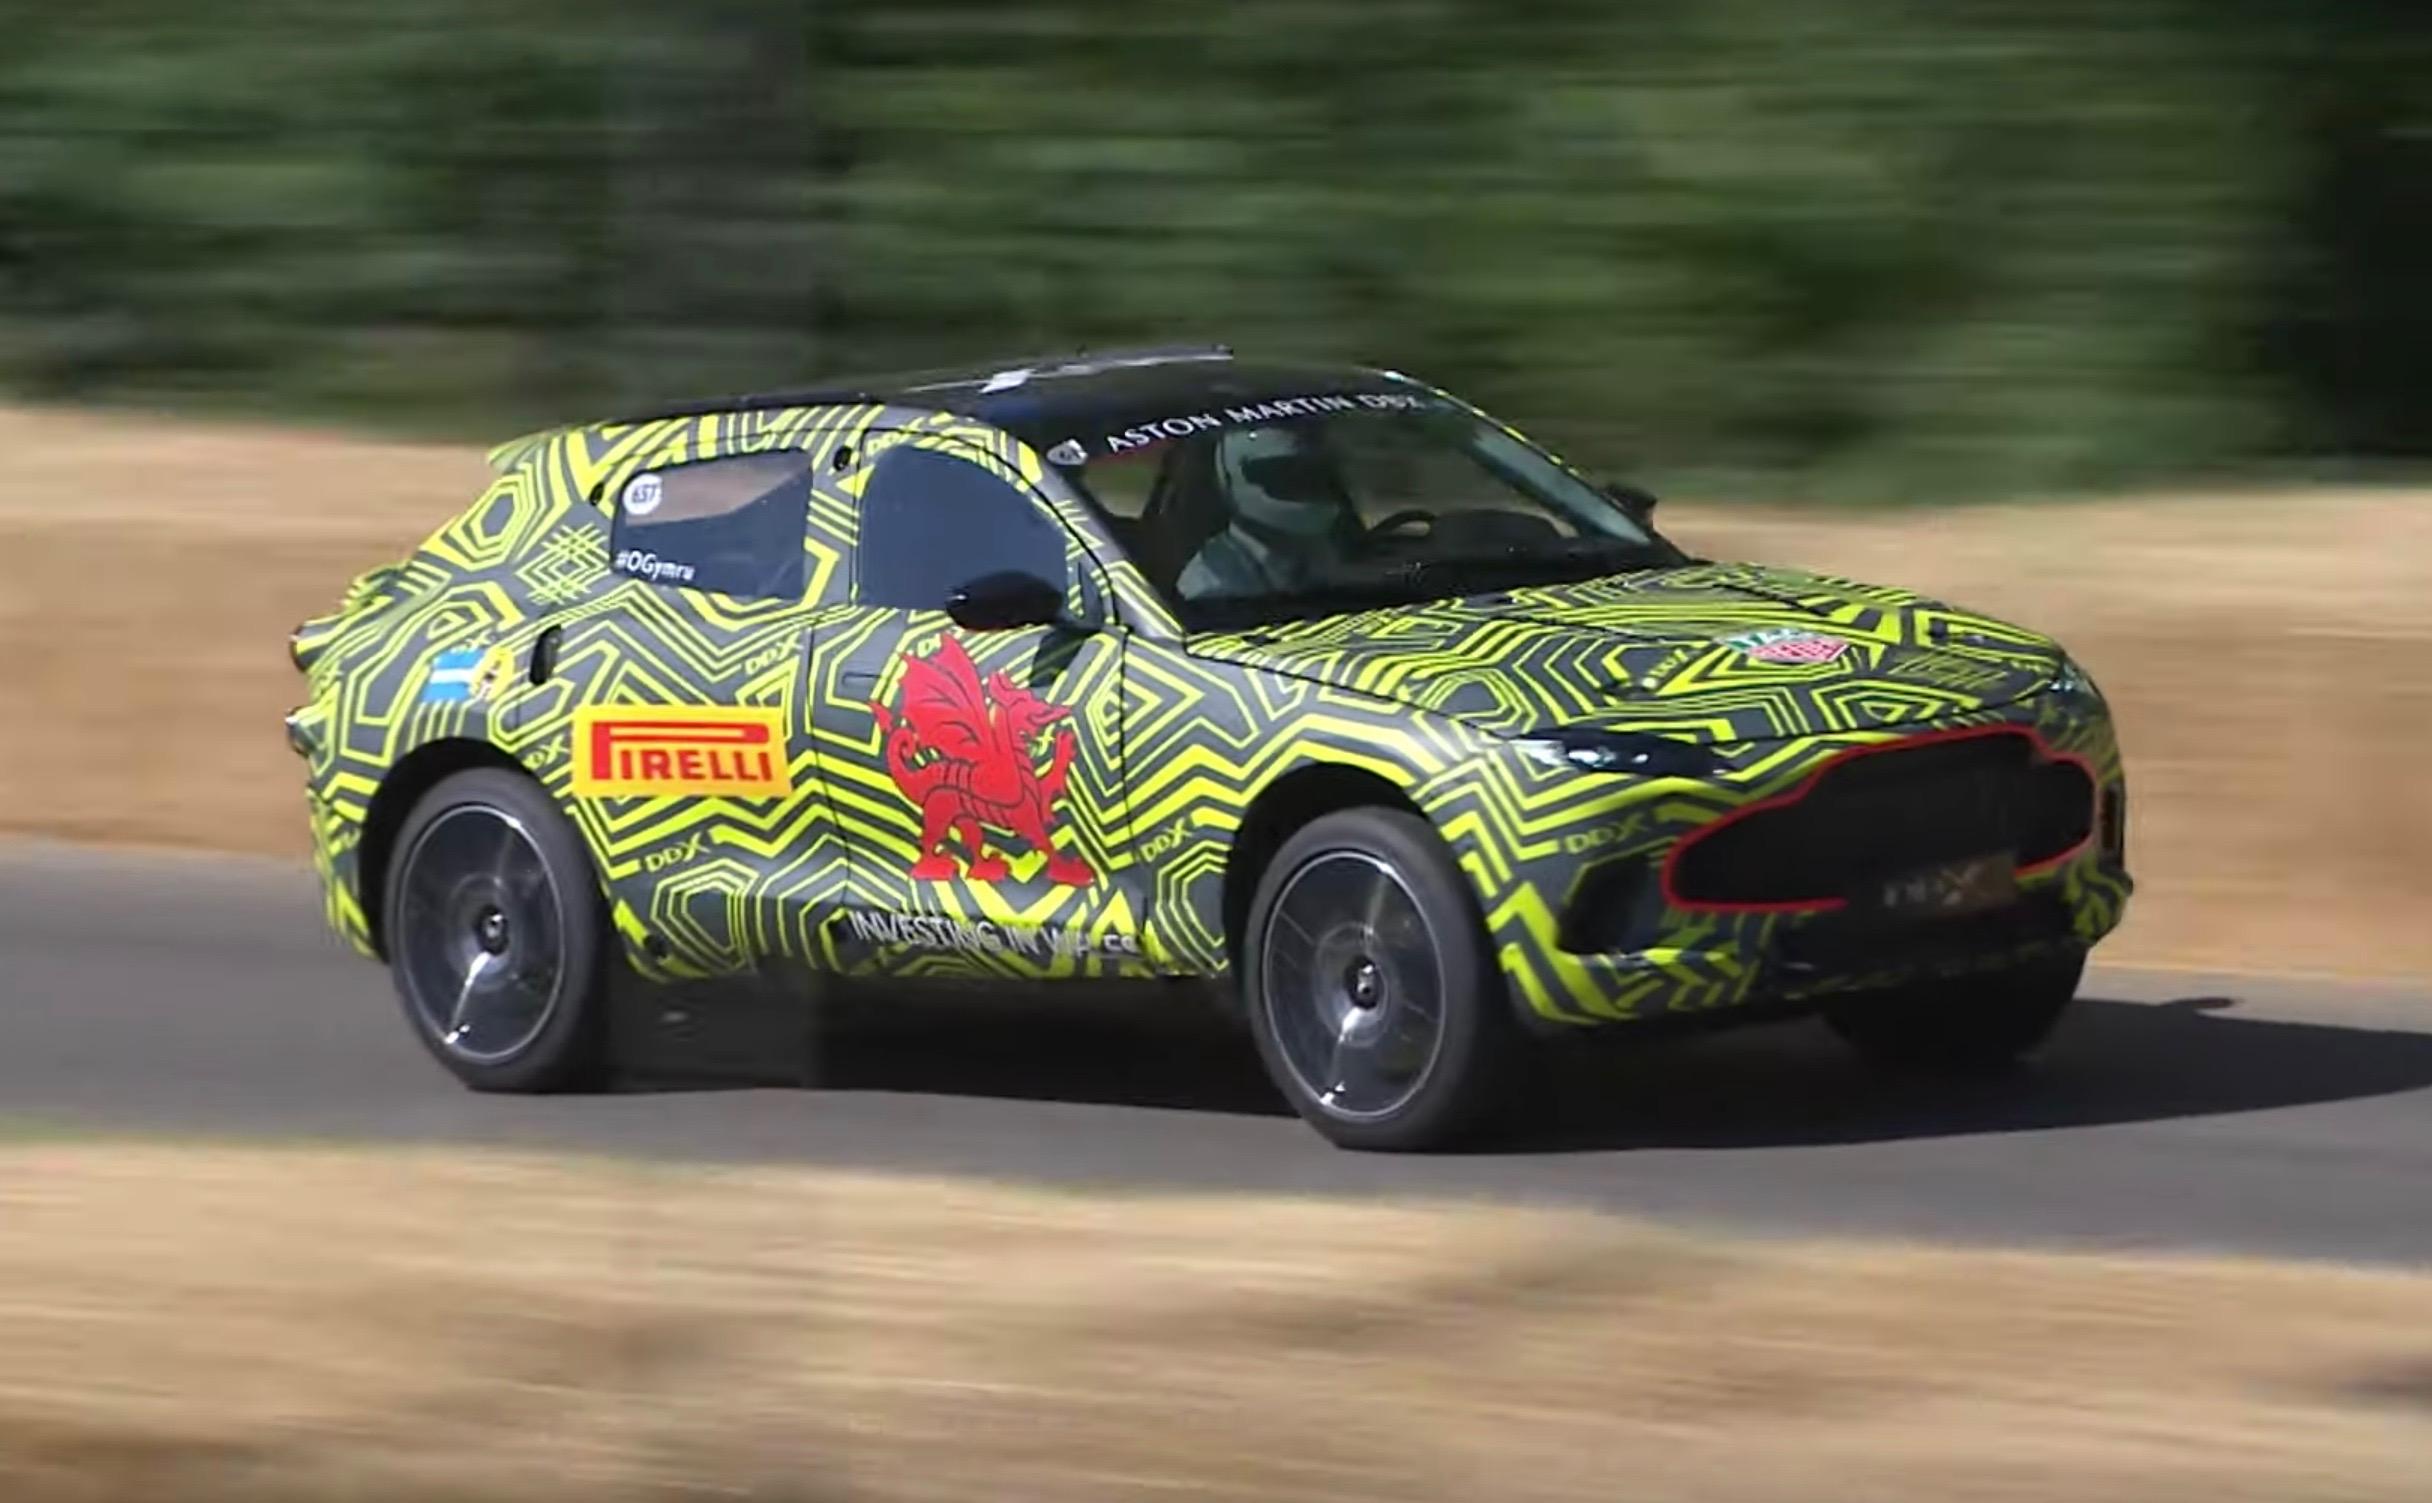 Aston Martin Dbx Takes On Goodwood V8 Confirmed Video Performancedrive